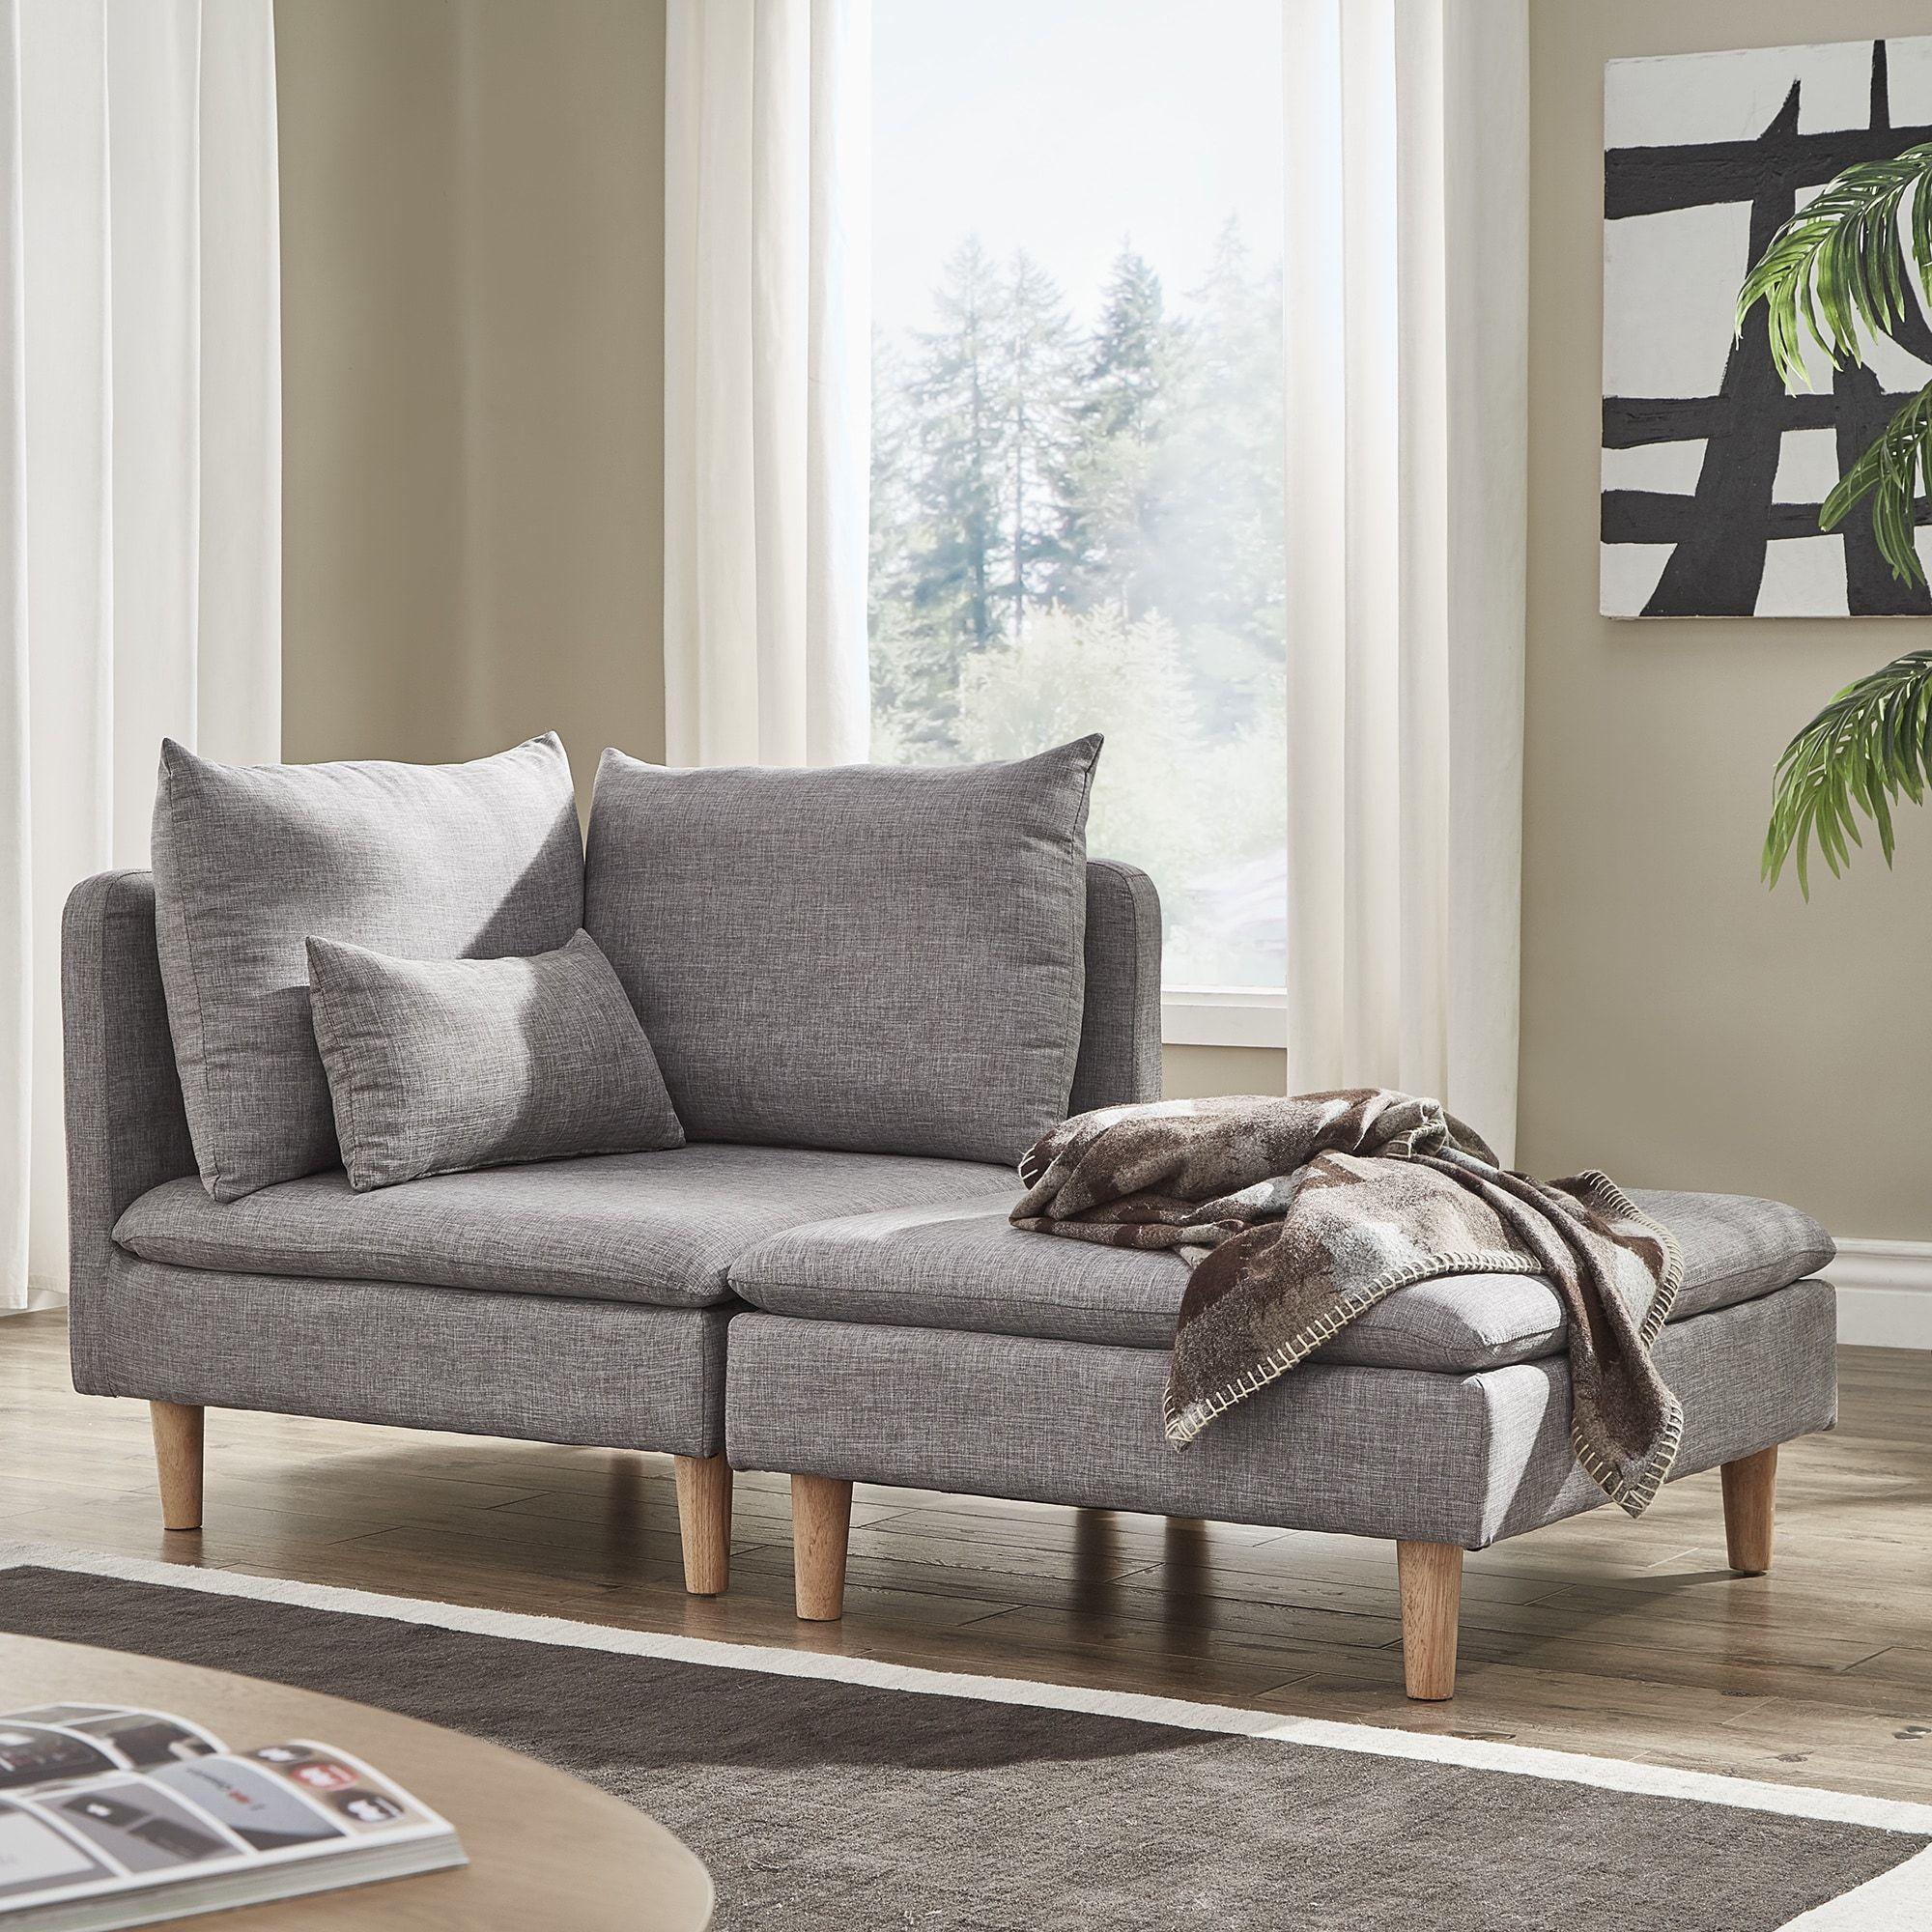 Malina Modular MidCentury Chair, Ottoman or Chaise Lounge